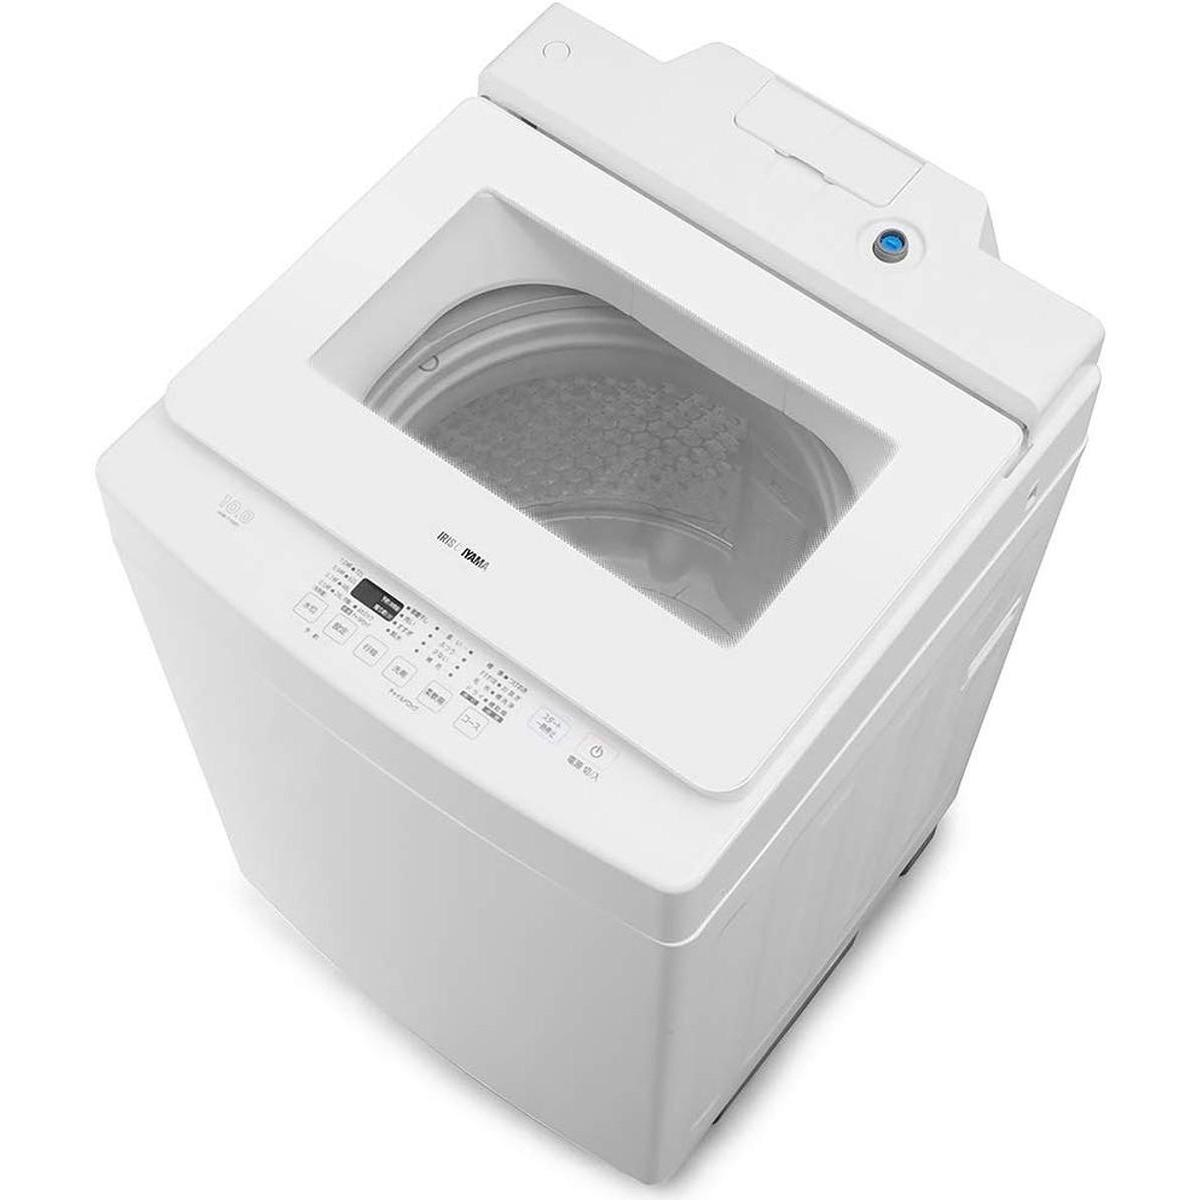 【I】【代引不可】アイリスオーヤマ 洗濯機 10kg 全自動洗濯機 自動洗剤投入 幅58.6cm ホワイト IAW-T1001